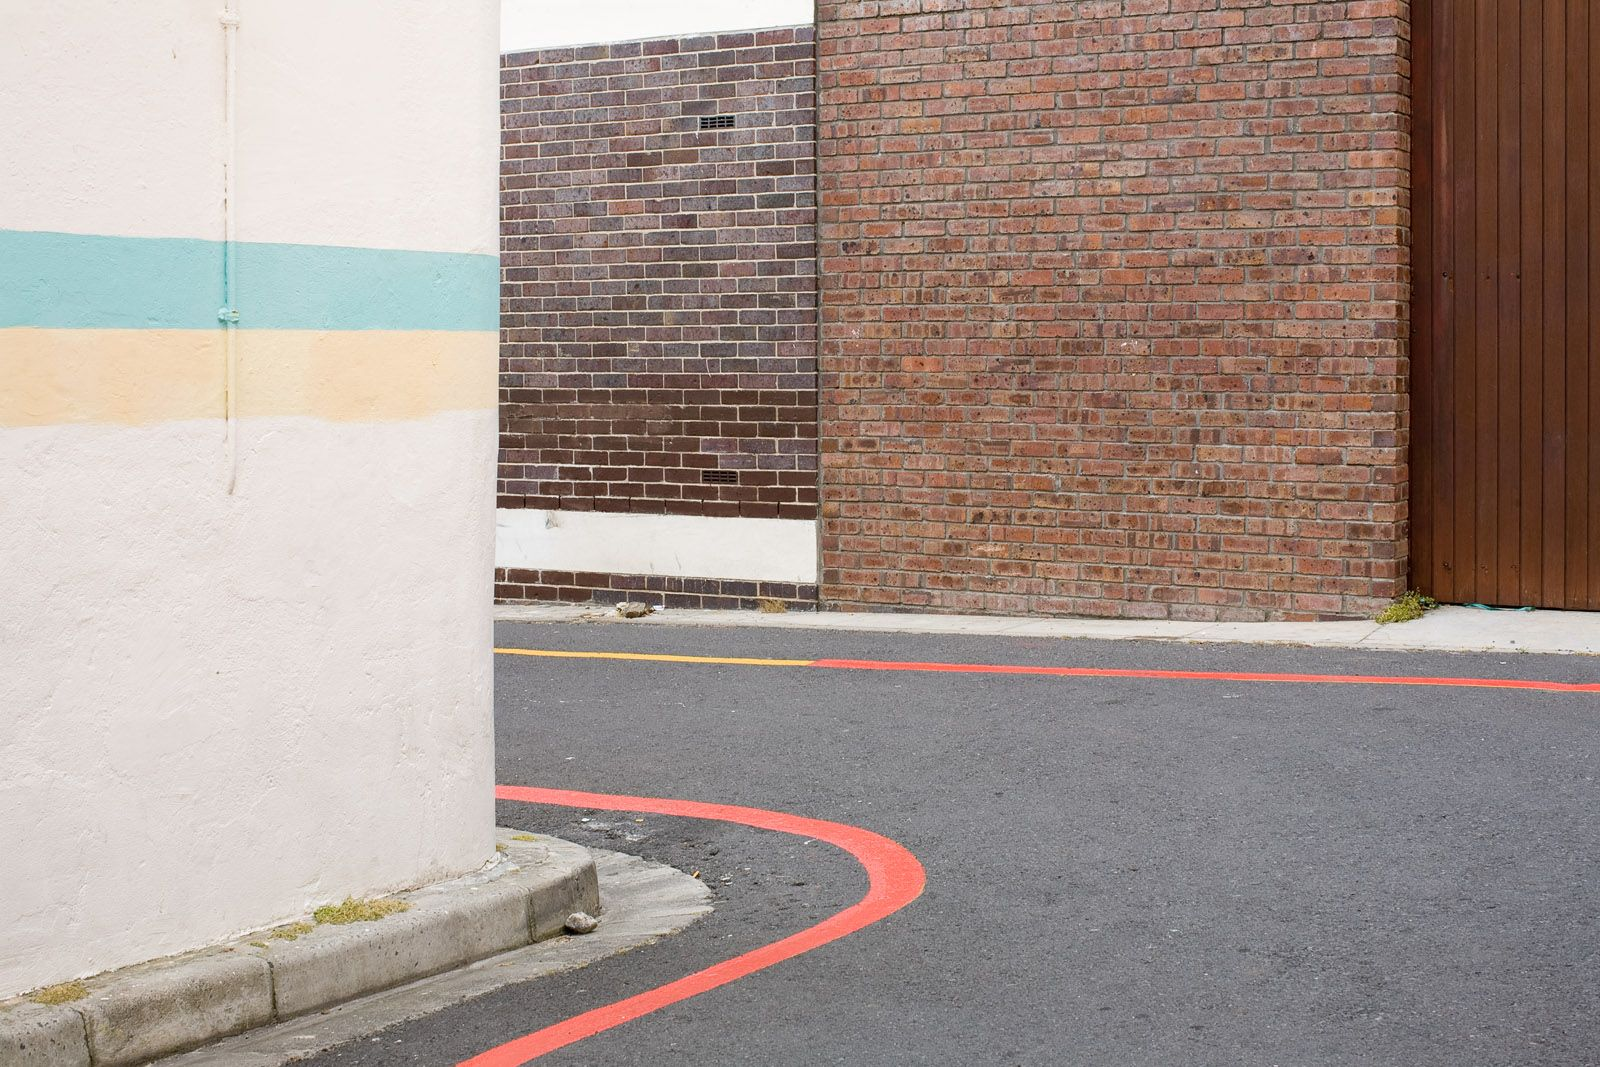 Burt Danckaert: Simple Present #199 (Cape Town), 2008